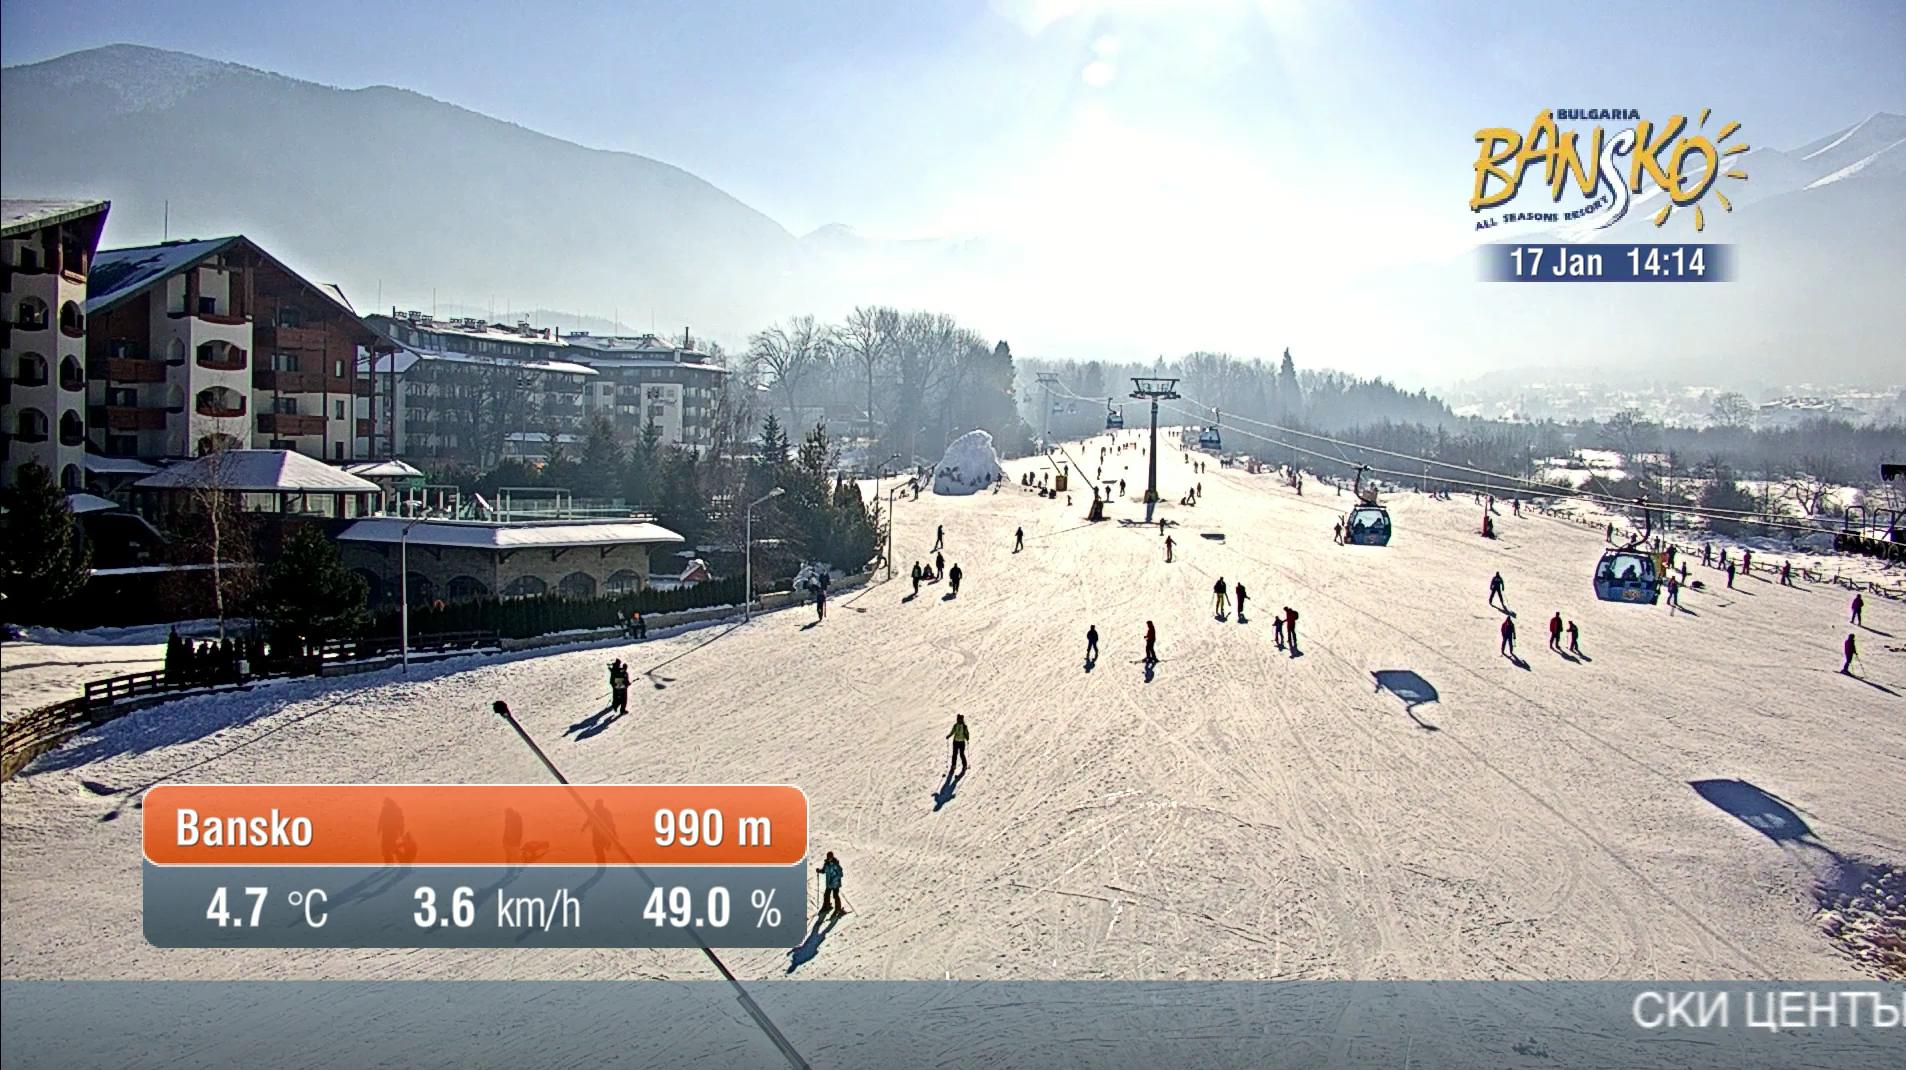 Bansko Ski Zone Panorama Cameras On Livestream